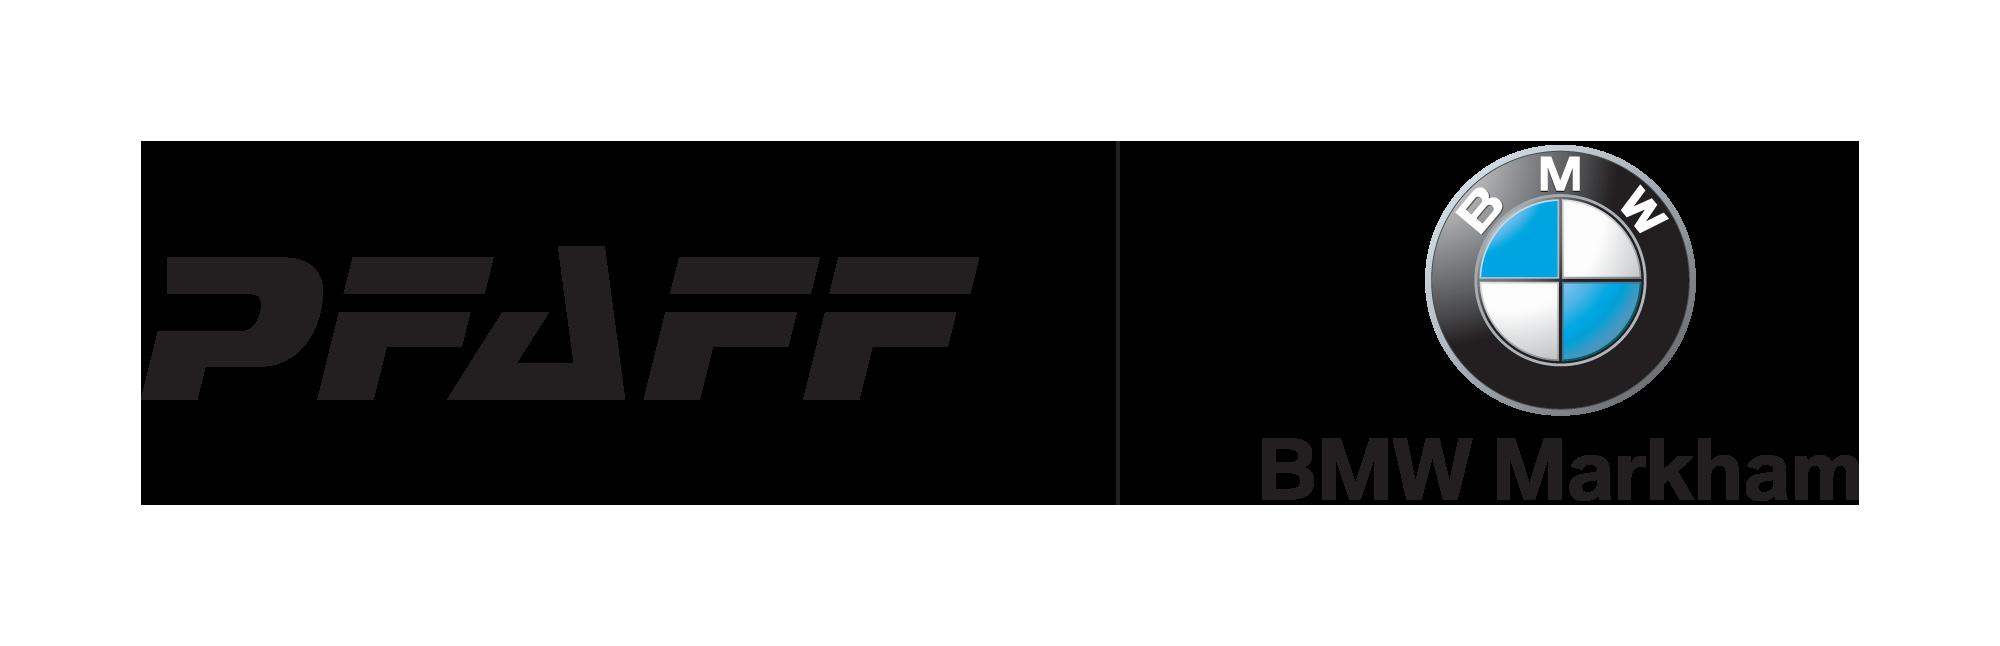 Pfaff-BMW-Markham-Positive.png